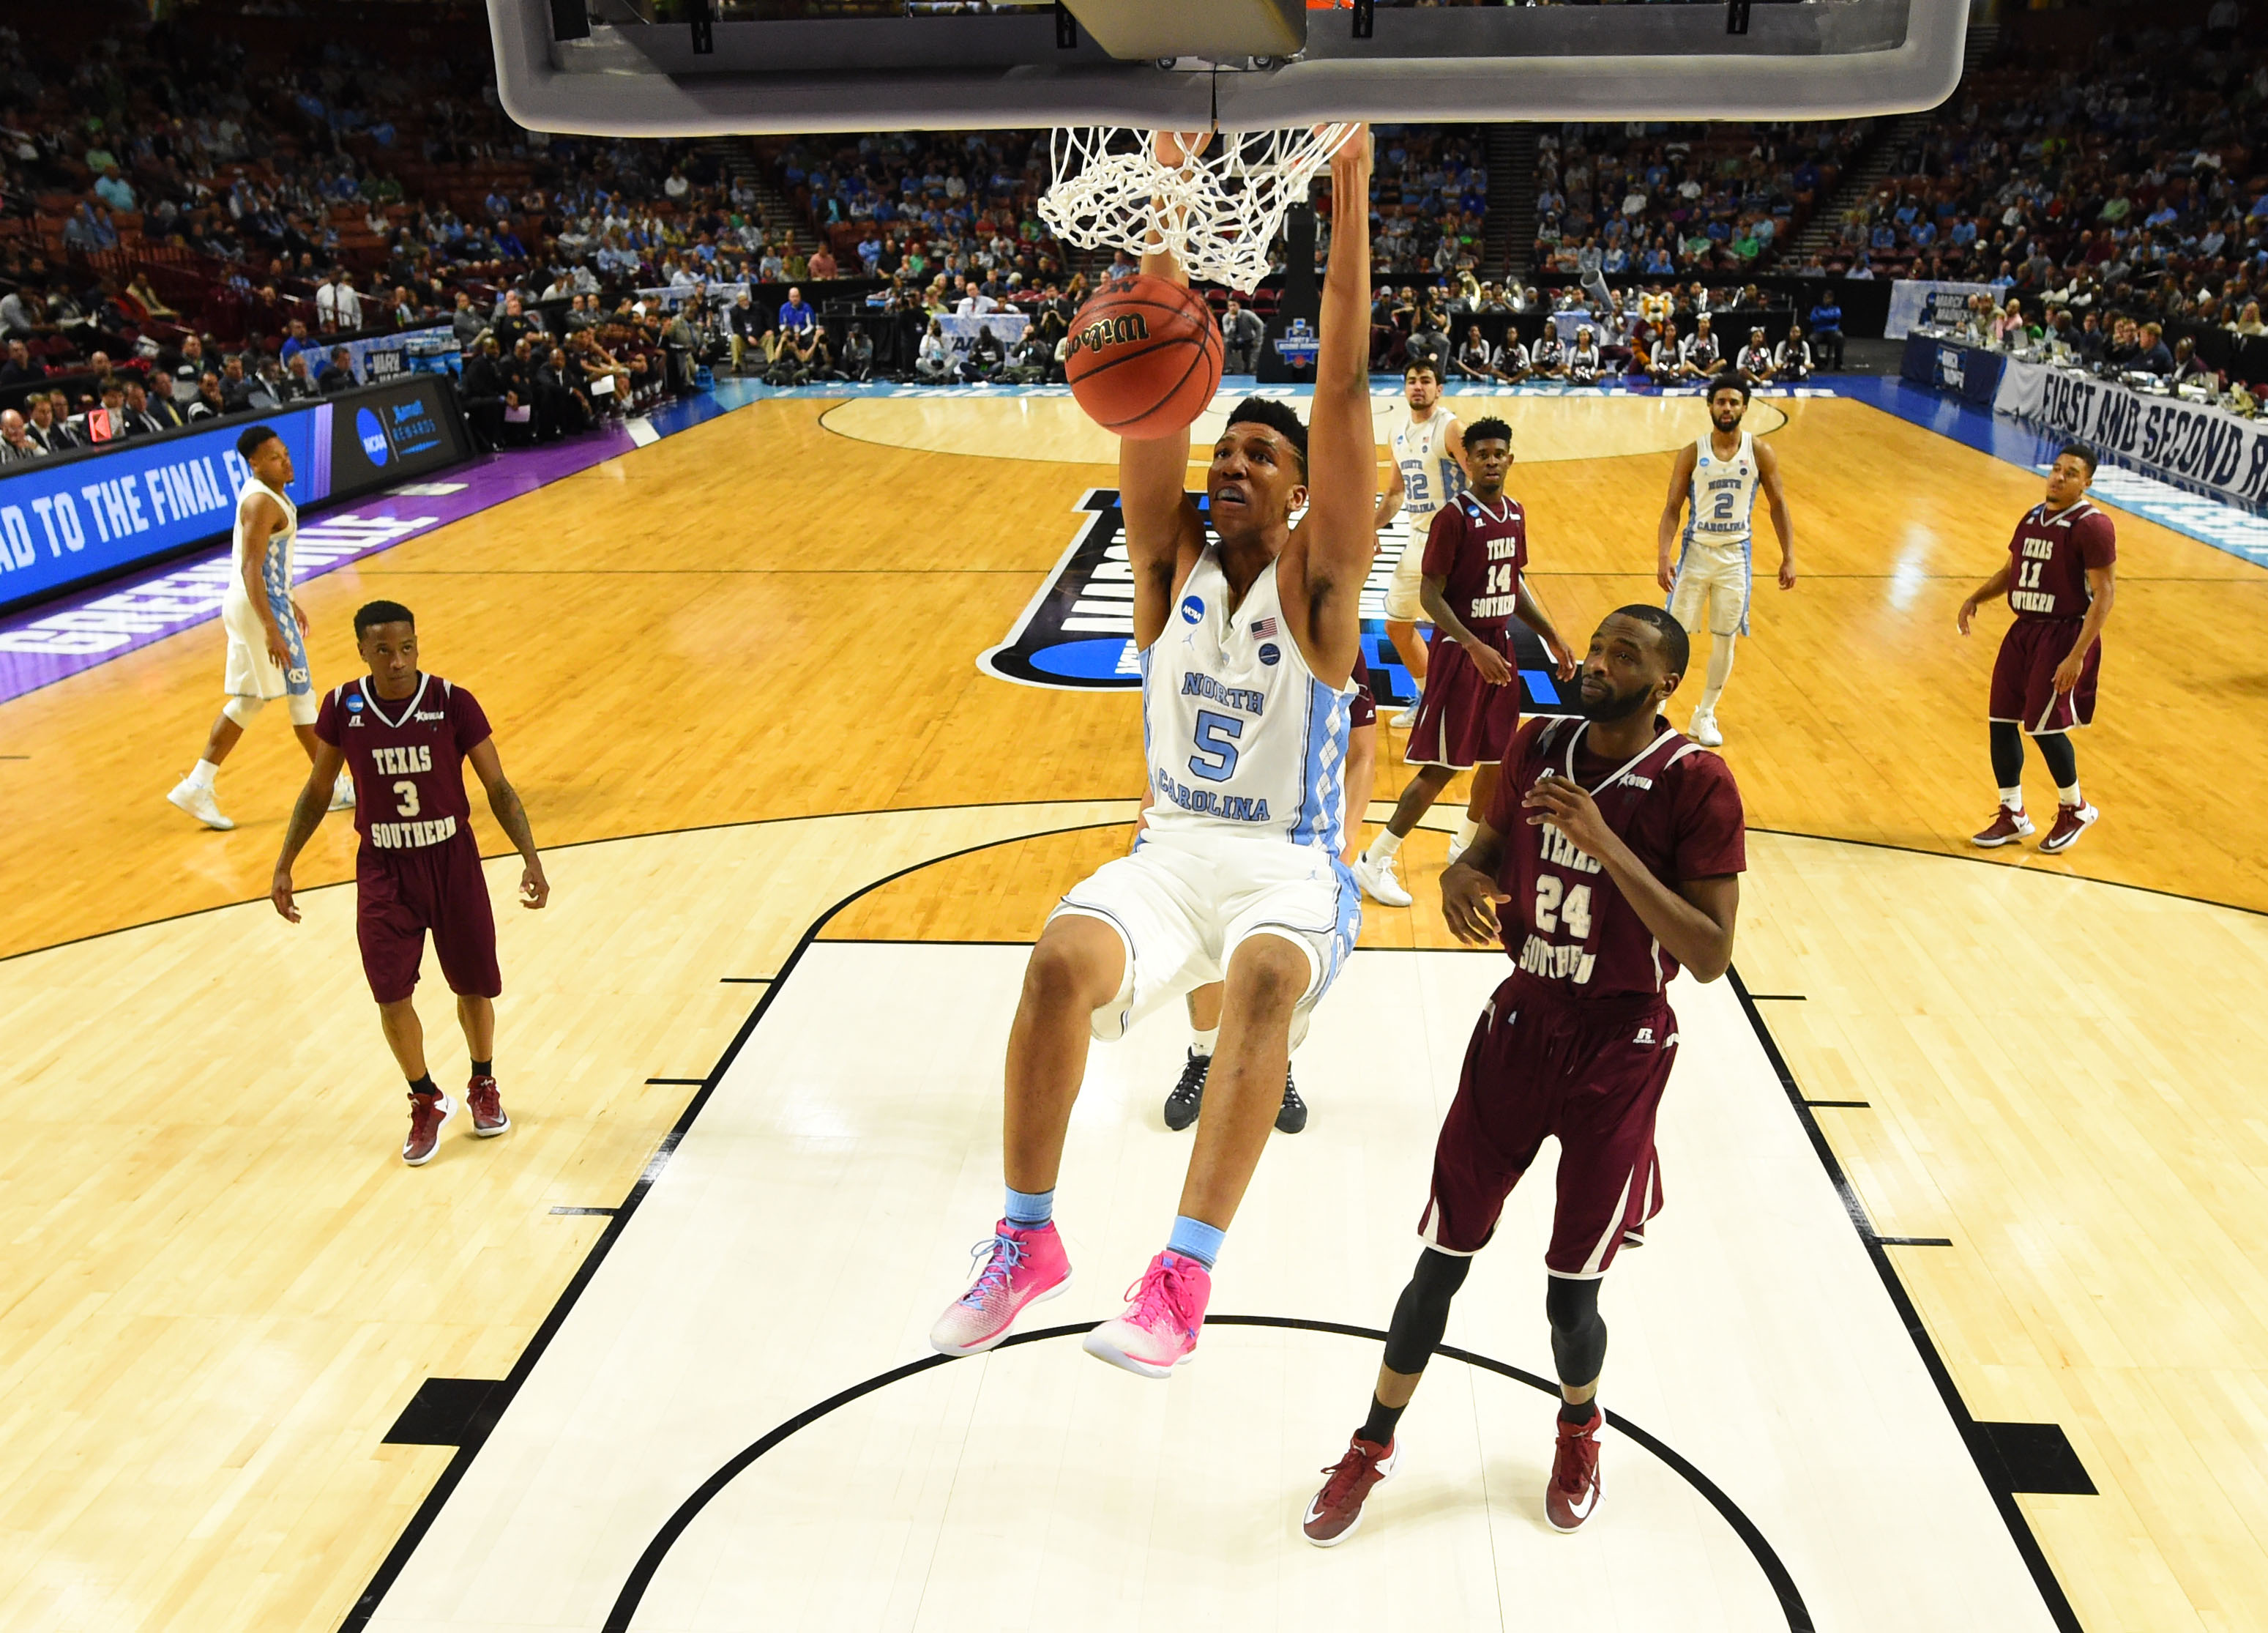 9950812-ncaa-basketball-ncaa-tournament-first-round-north-carolina-vs-texas-southern